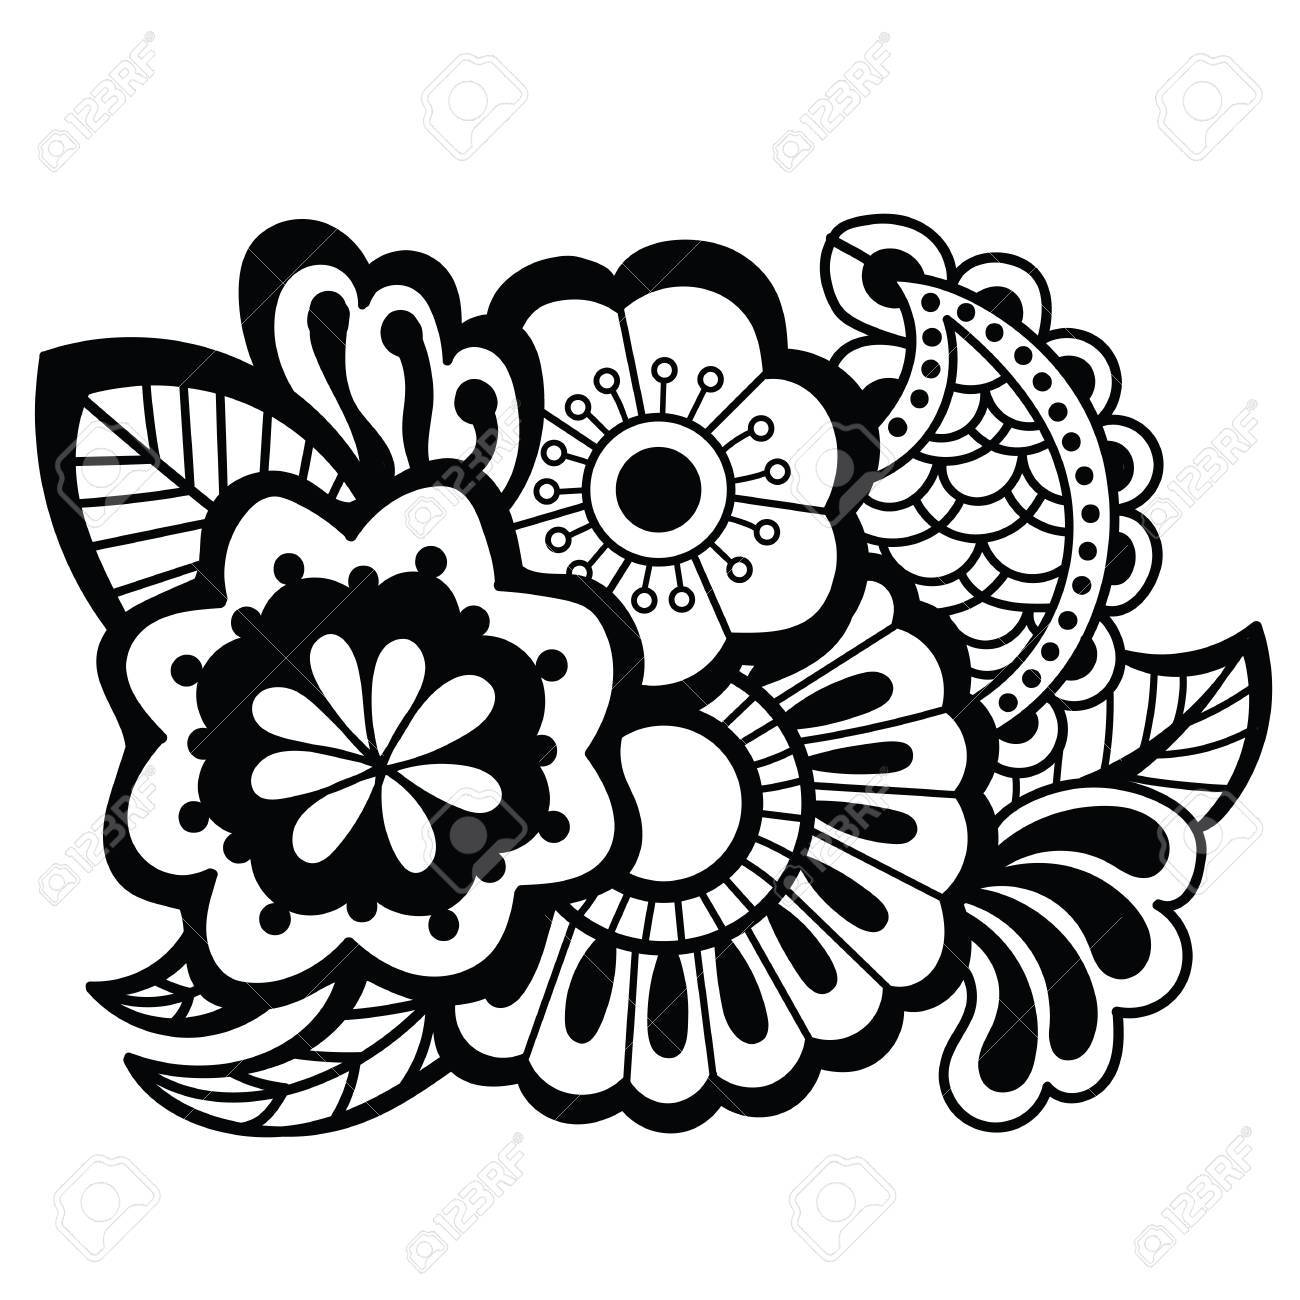 mehndi design floral pattern royalty free cliparts vectors and Floral Design Card mehndi design floral pattern stock vector 77920808